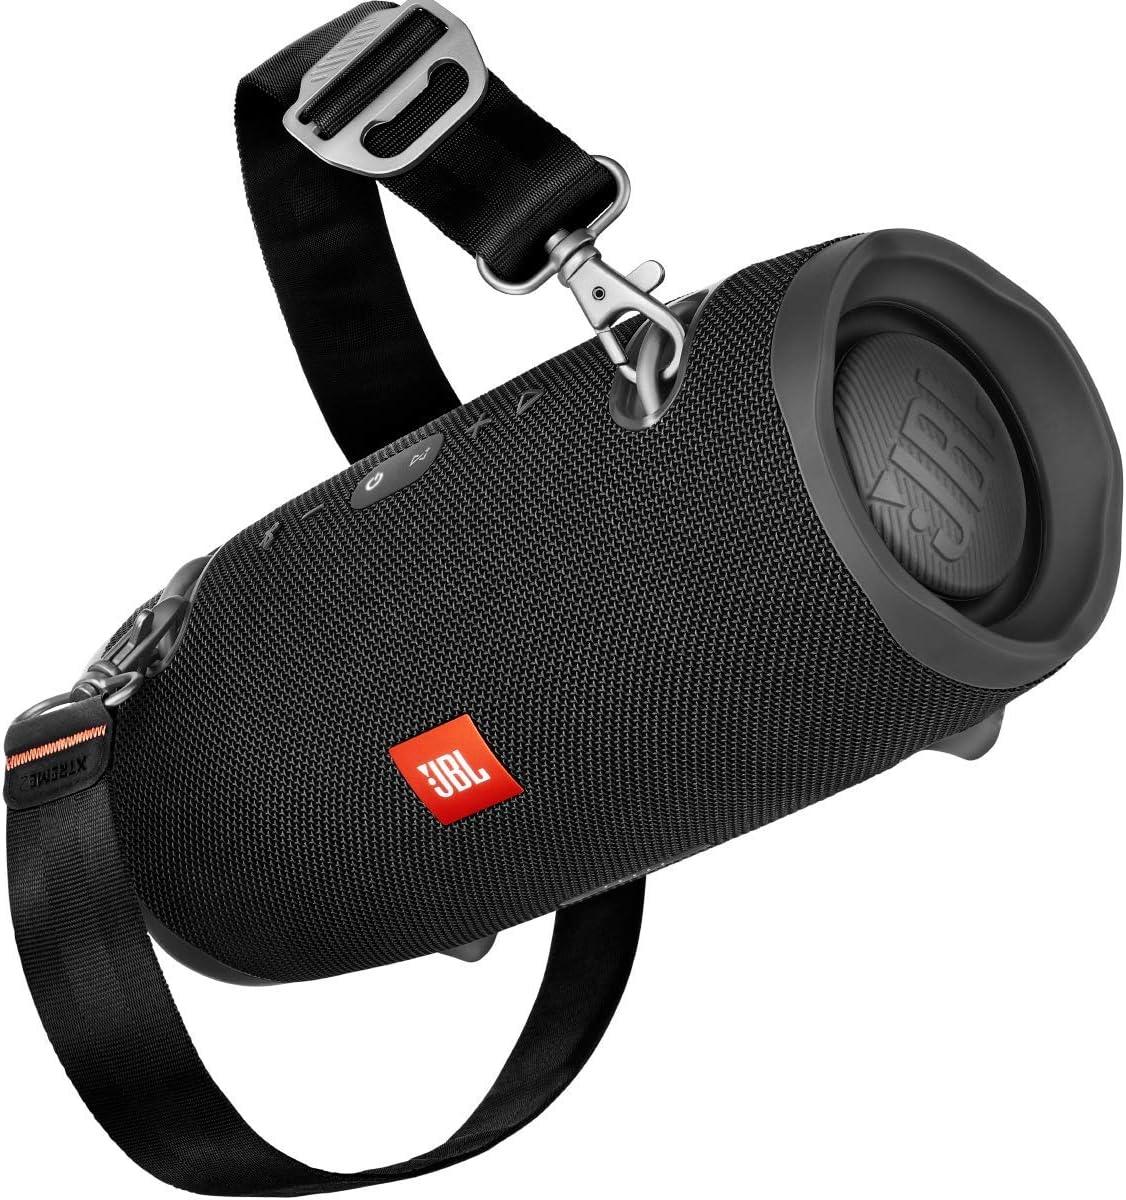 JBL Xtreme 2 Portable Waterproof Wireless Bluetooth Speaker Renewed Black